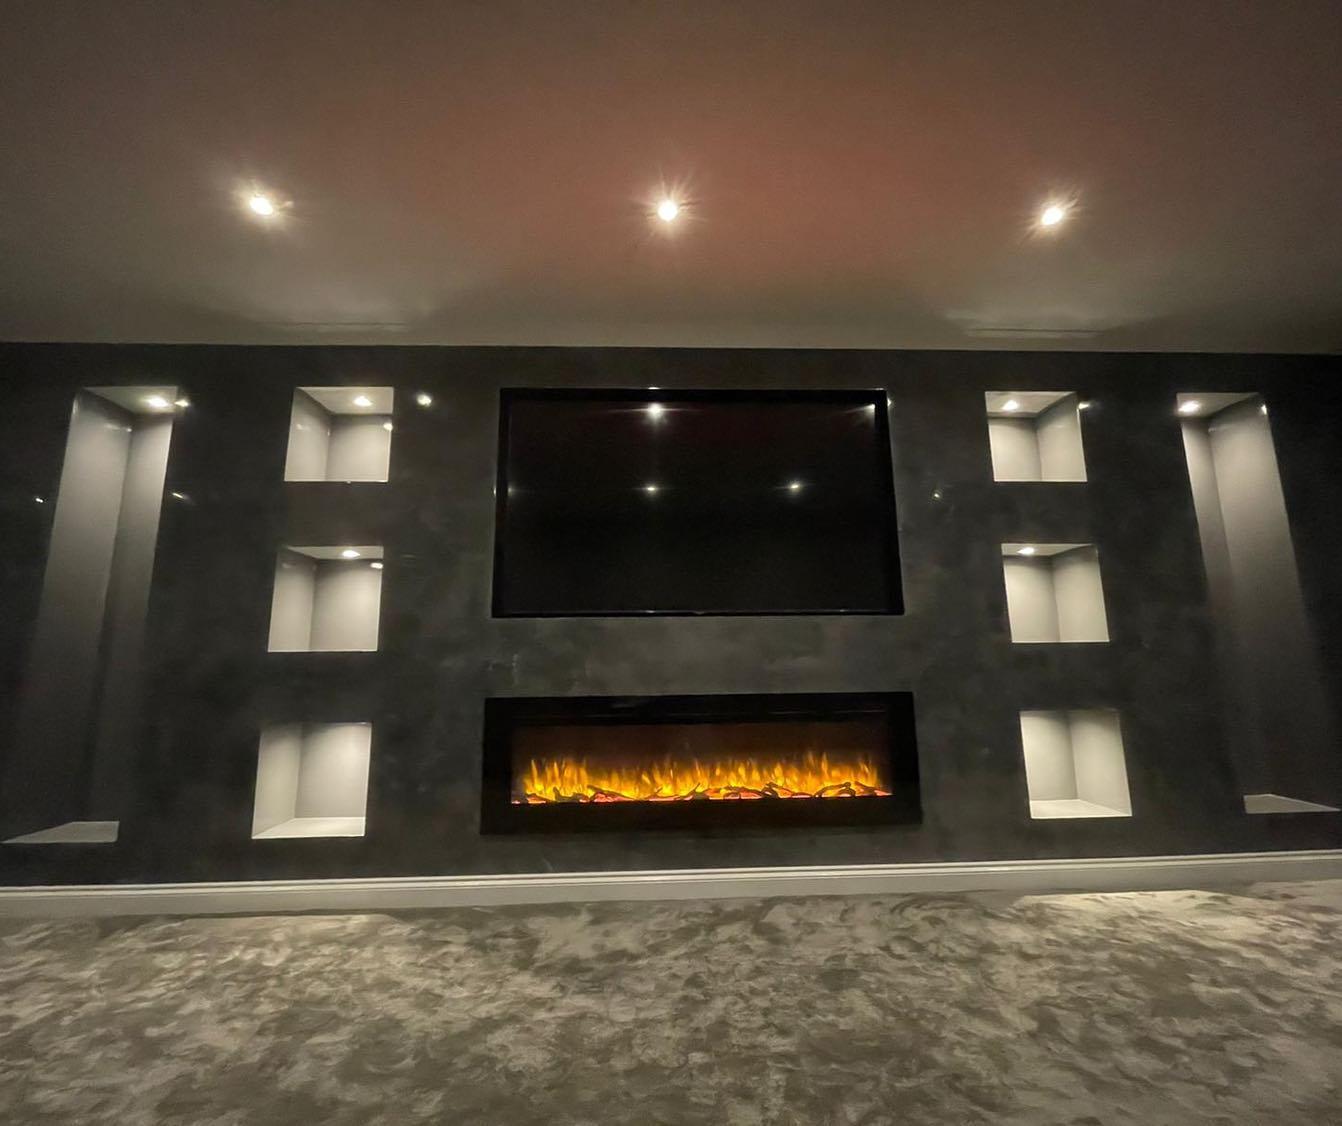 Kmac Venetian Plasterers - Venetian Plastering TV feature wall at night - Glasgow Scotland